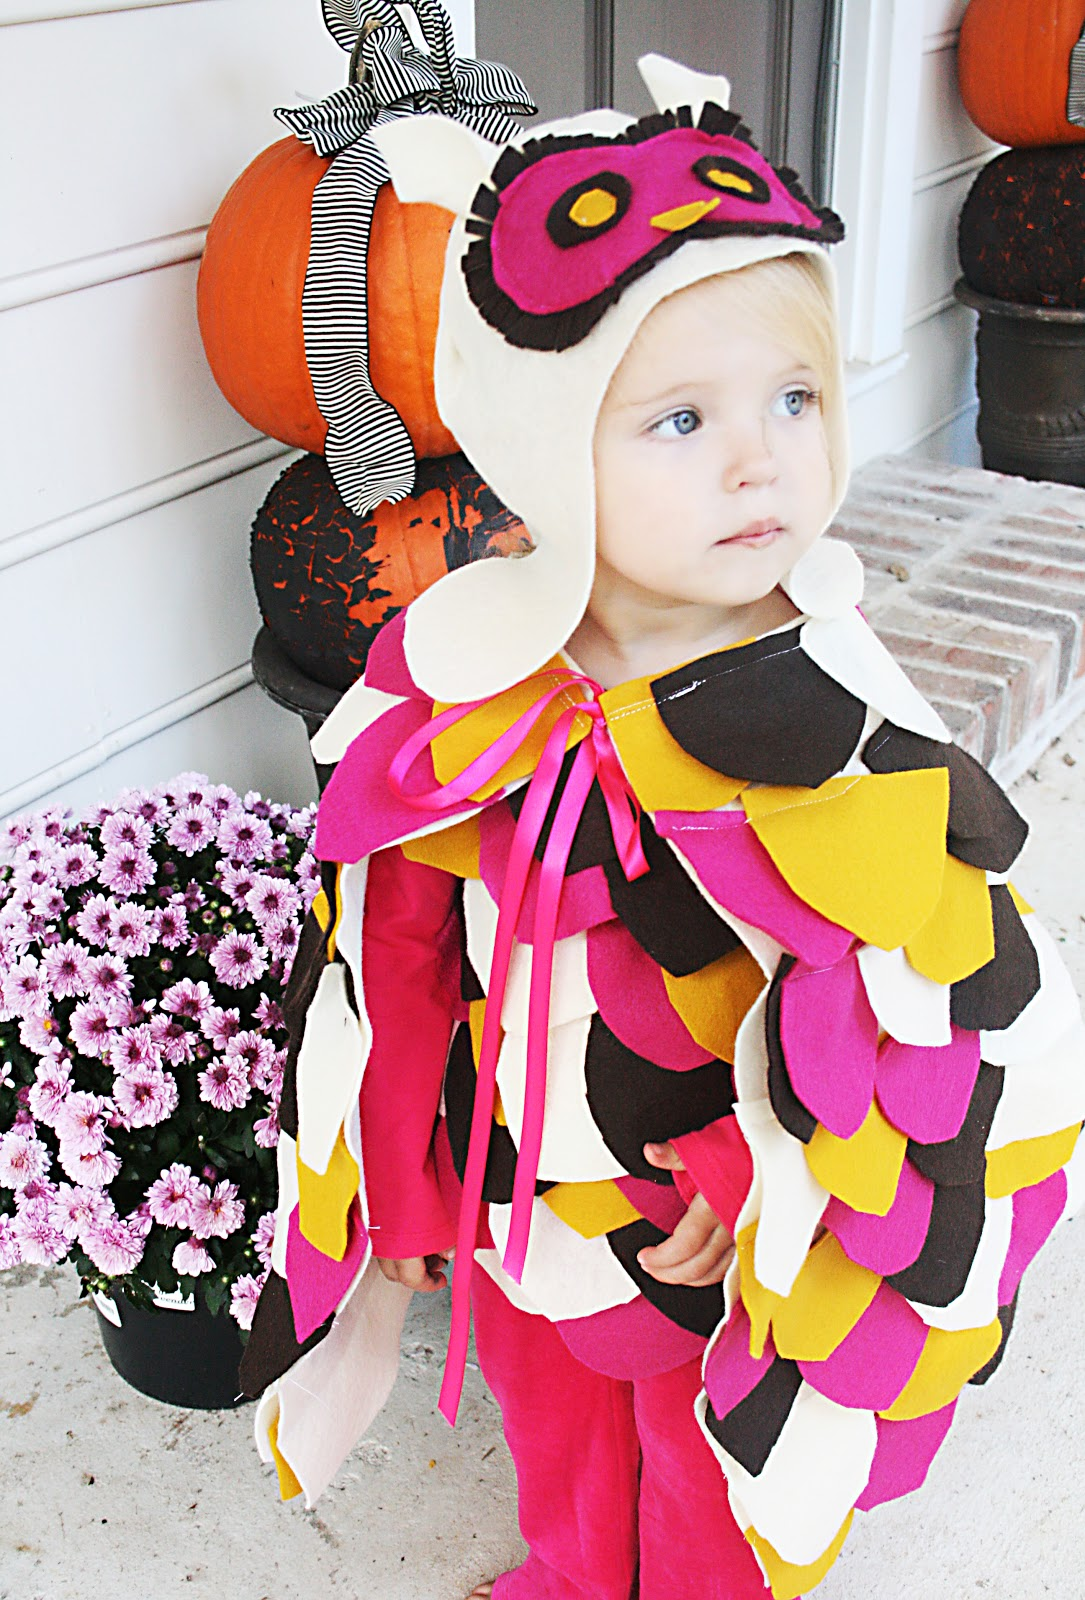 Halloween 2012 - Darling Darleen | A Lifestyle Design Blog